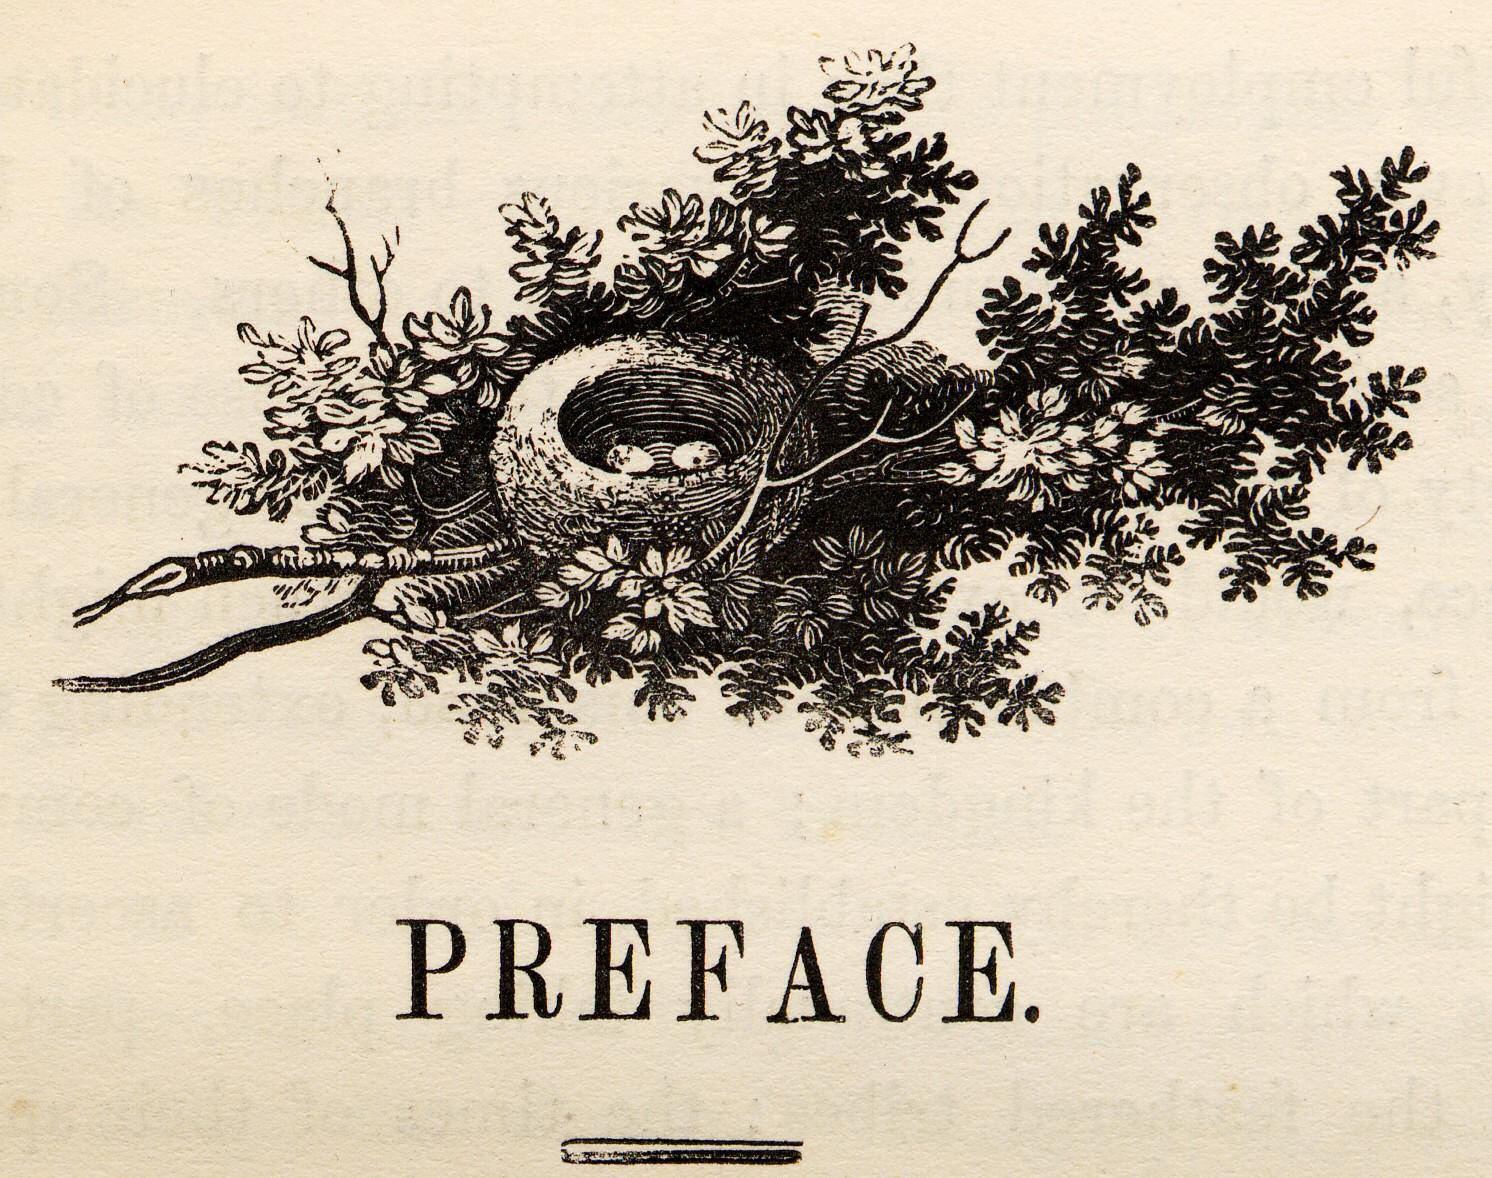 Filebirds Nest Engraving In Bewicks British Birds By Charlton